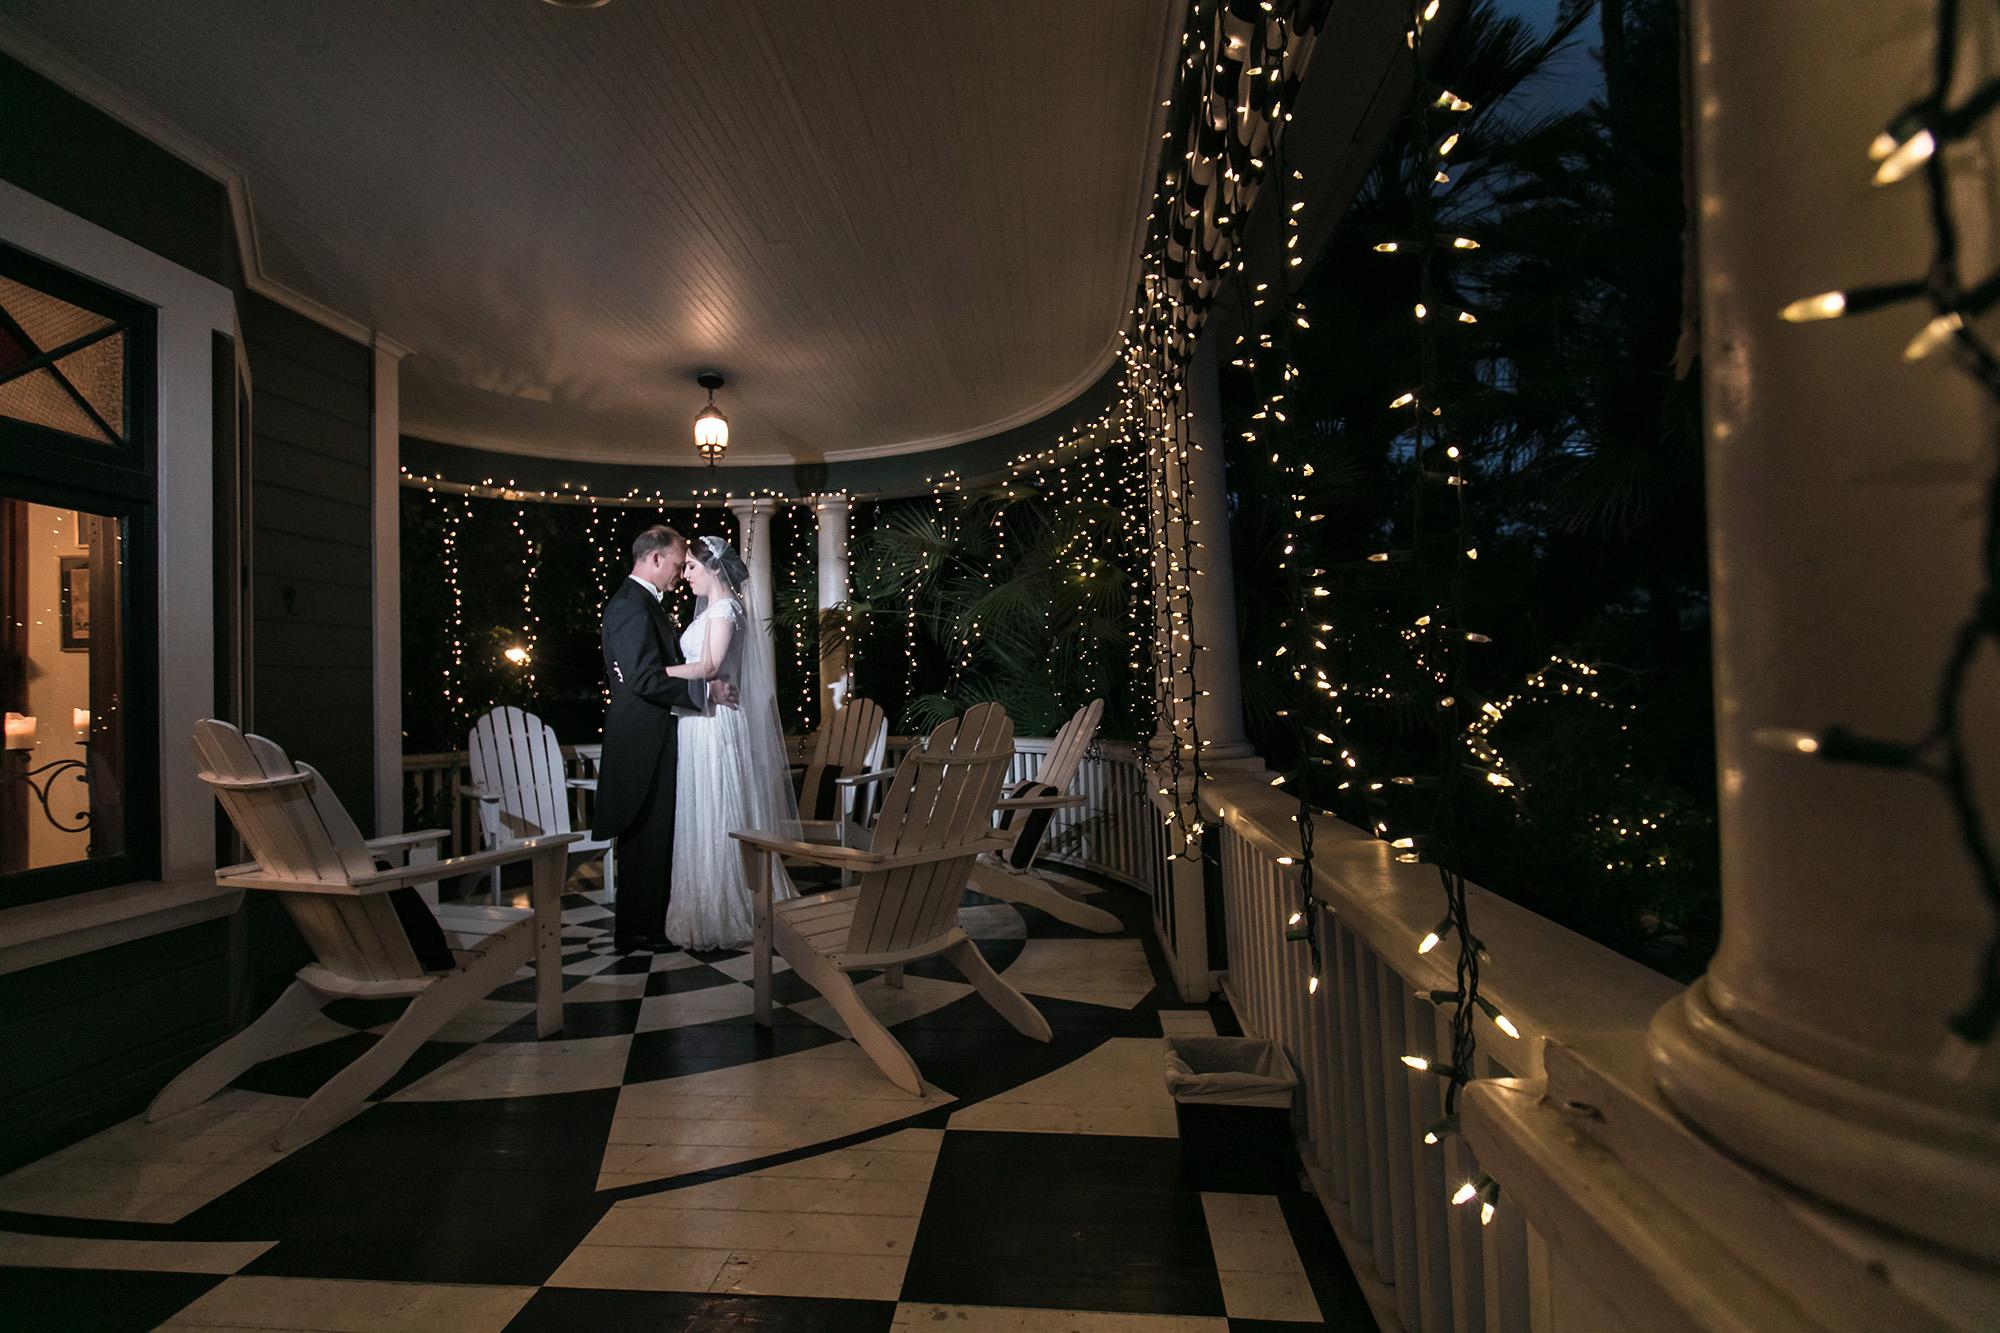 vintage-inspired-christmas-house-wedding-carrie-vines-120.jpg